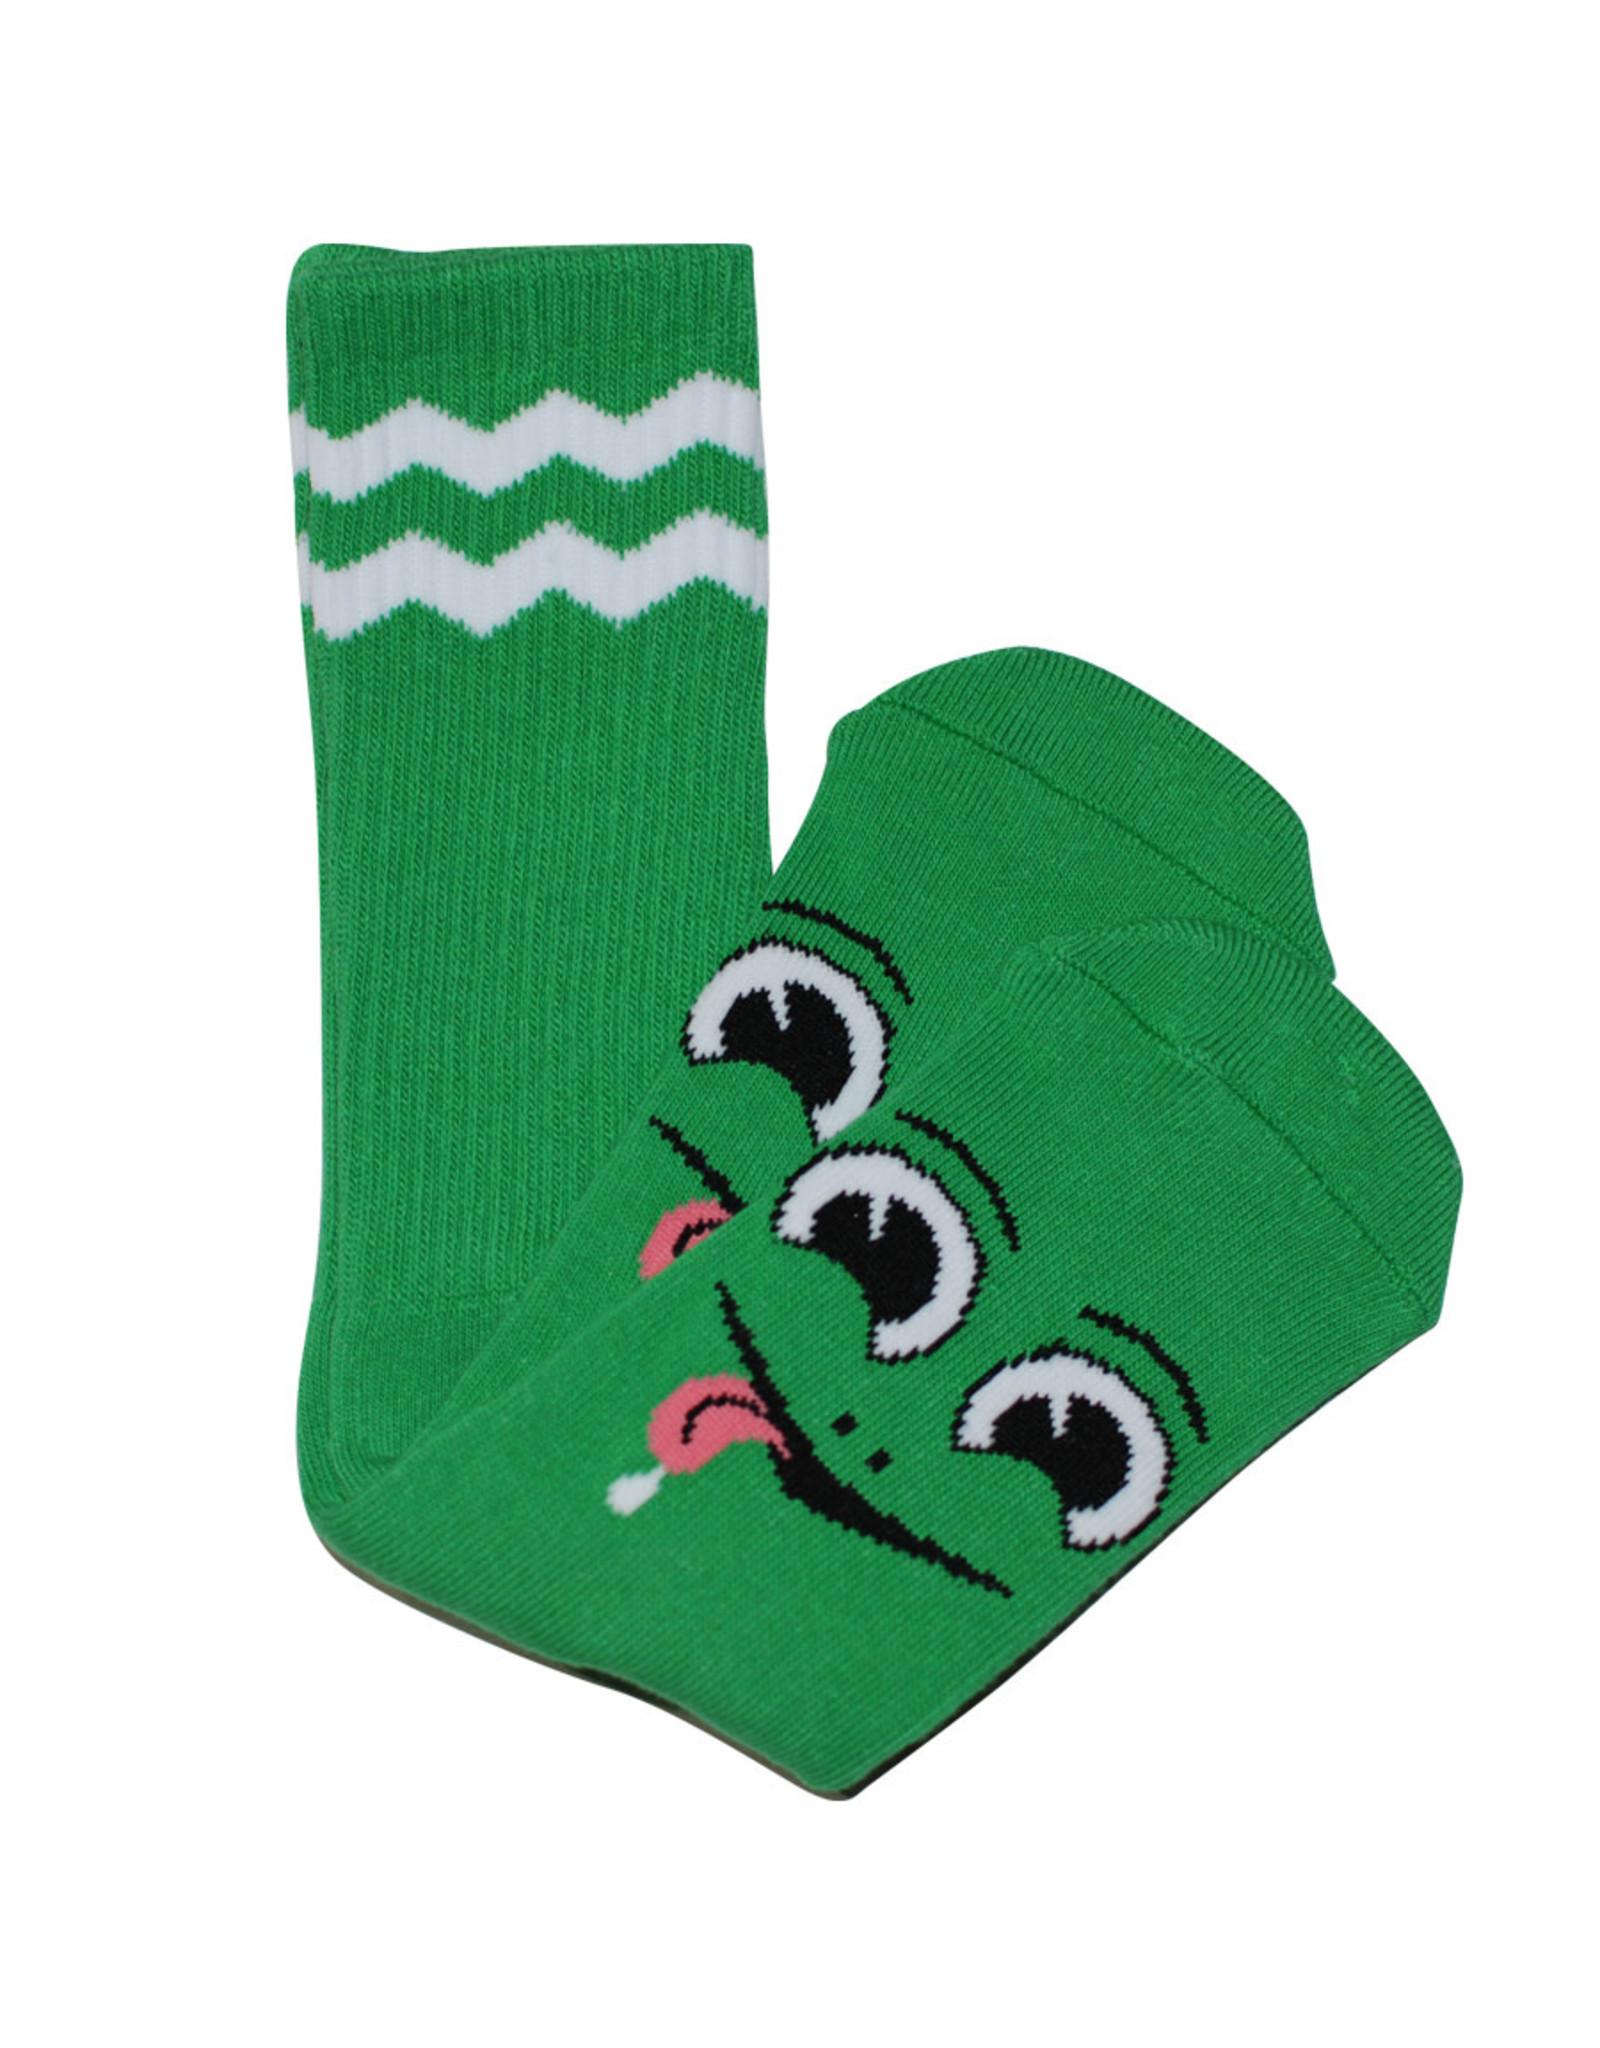 Toy Machine Toy Machine Socks Happy Turtle Crew (Green)